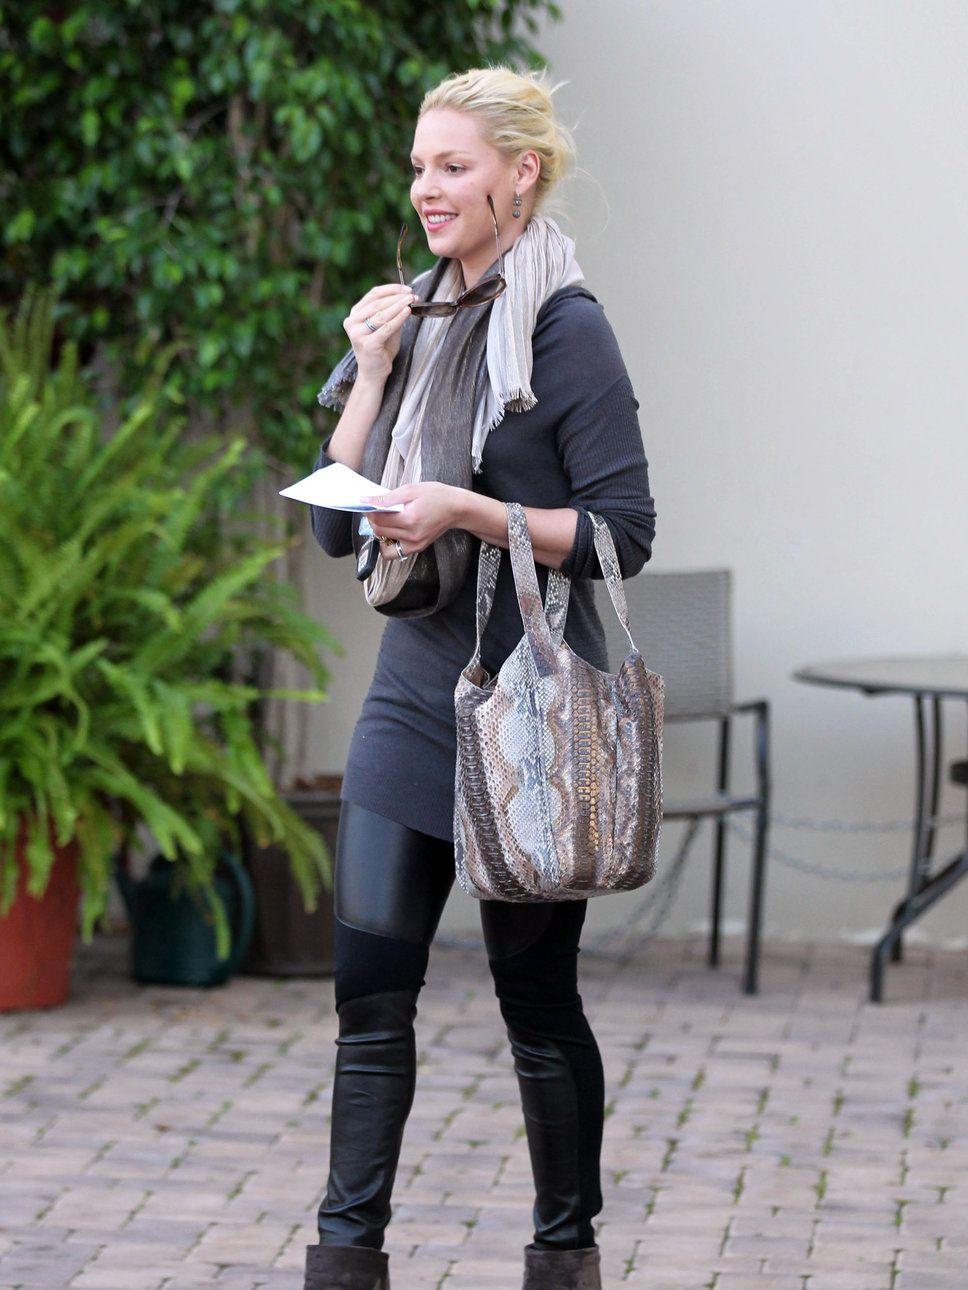 leggings and boots katherine heigl leggings boots scarf. Black Bedroom Furniture Sets. Home Design Ideas